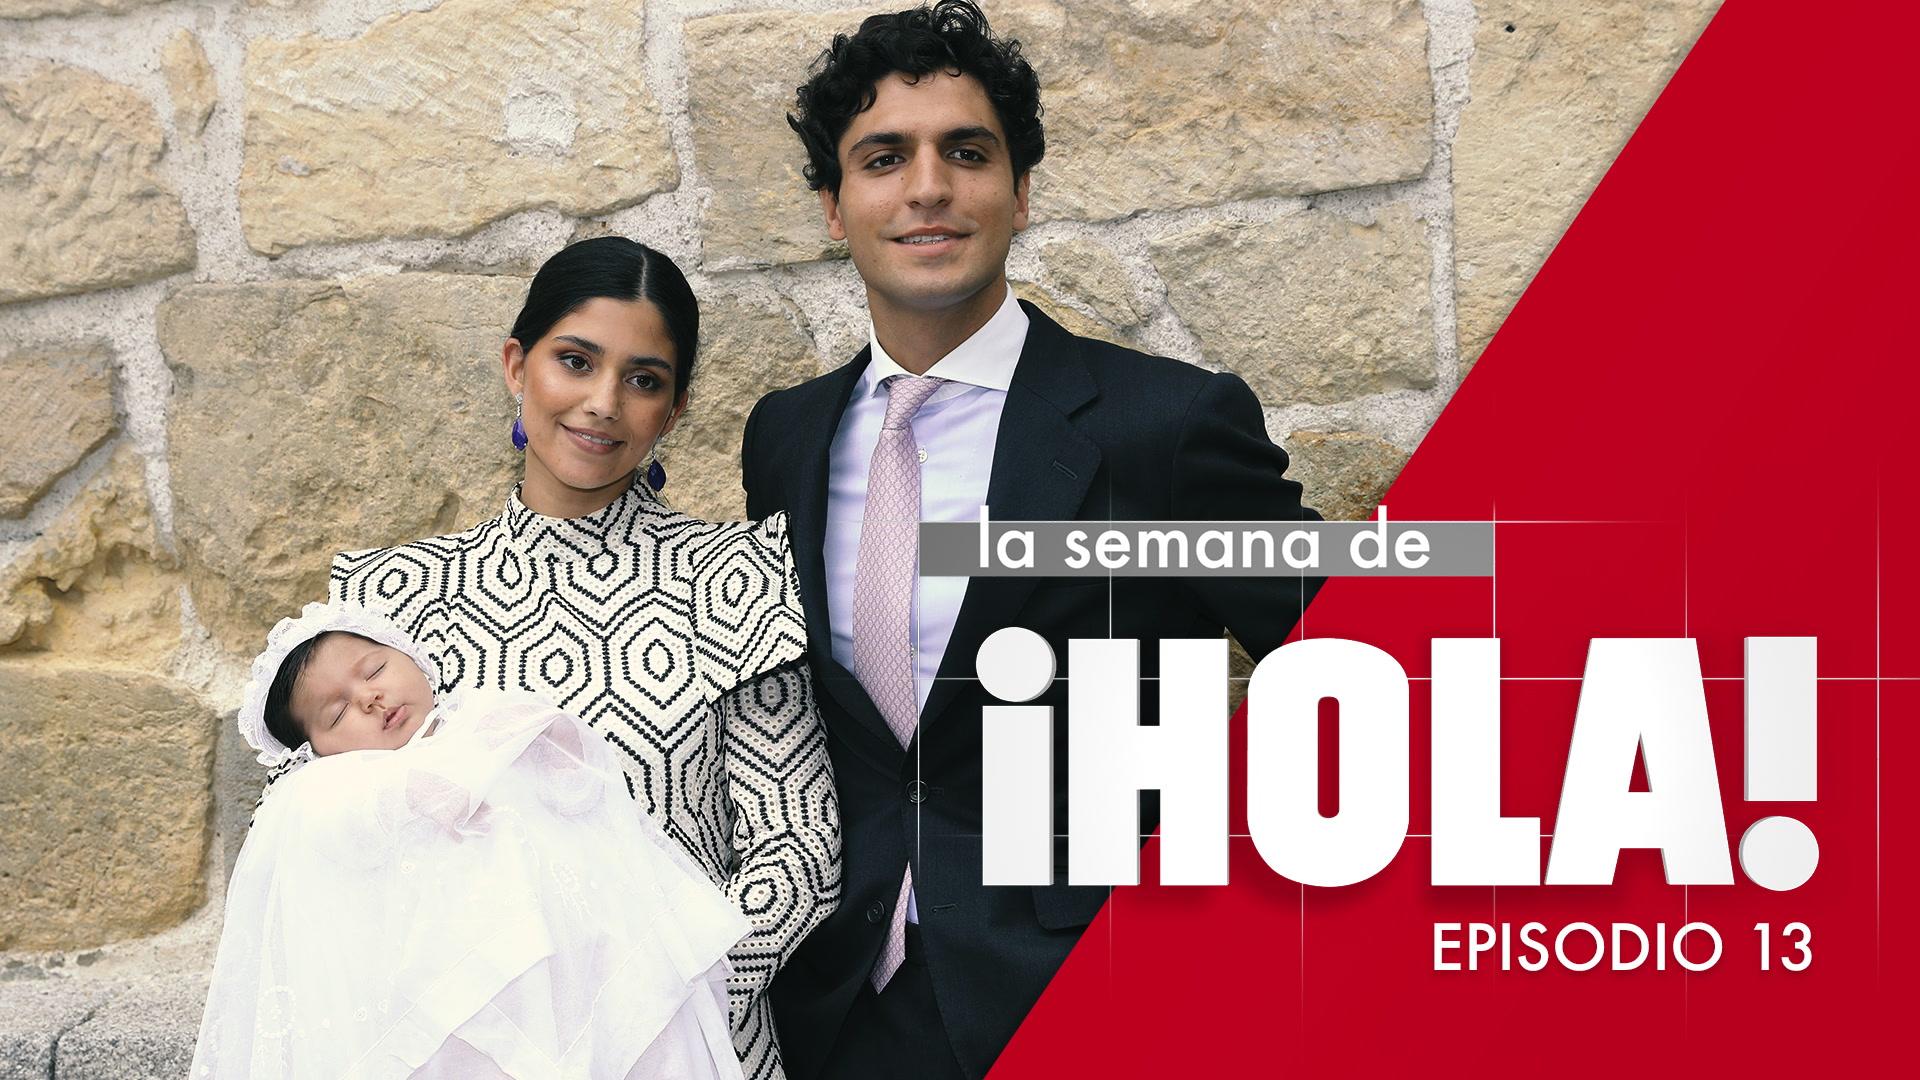 La semana de ¡HOLA! - Episodio 13